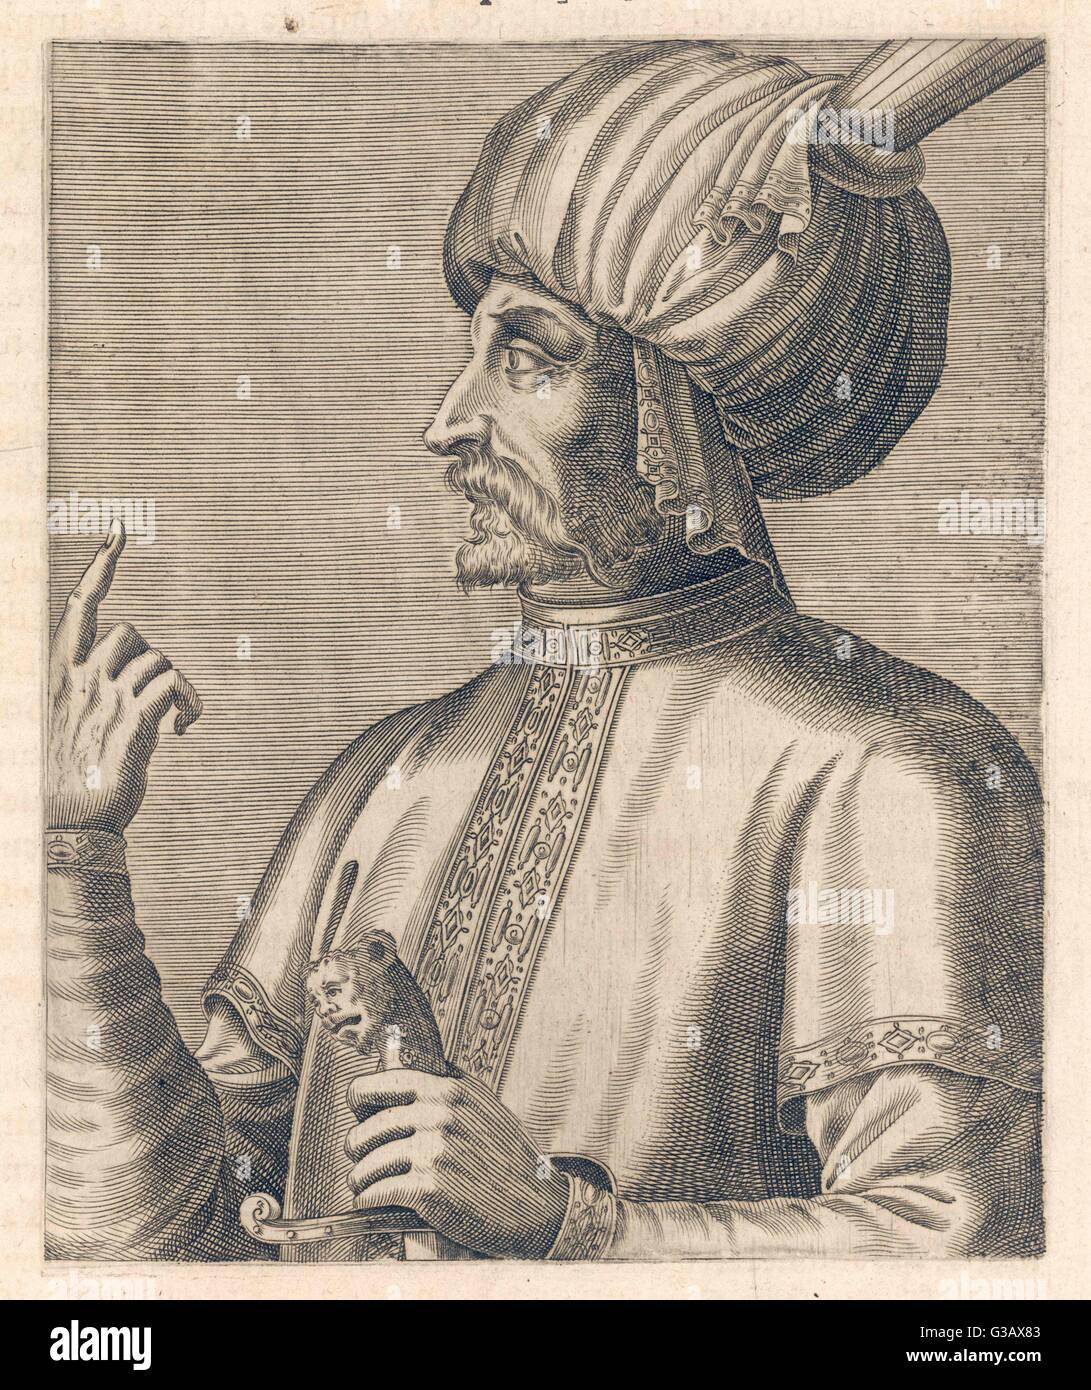 ESMAIL I or SHAHANSHAH  (King of Kings)  Shah of Iran (1501-24)      Date: 1487 - 1524 - Stock Image